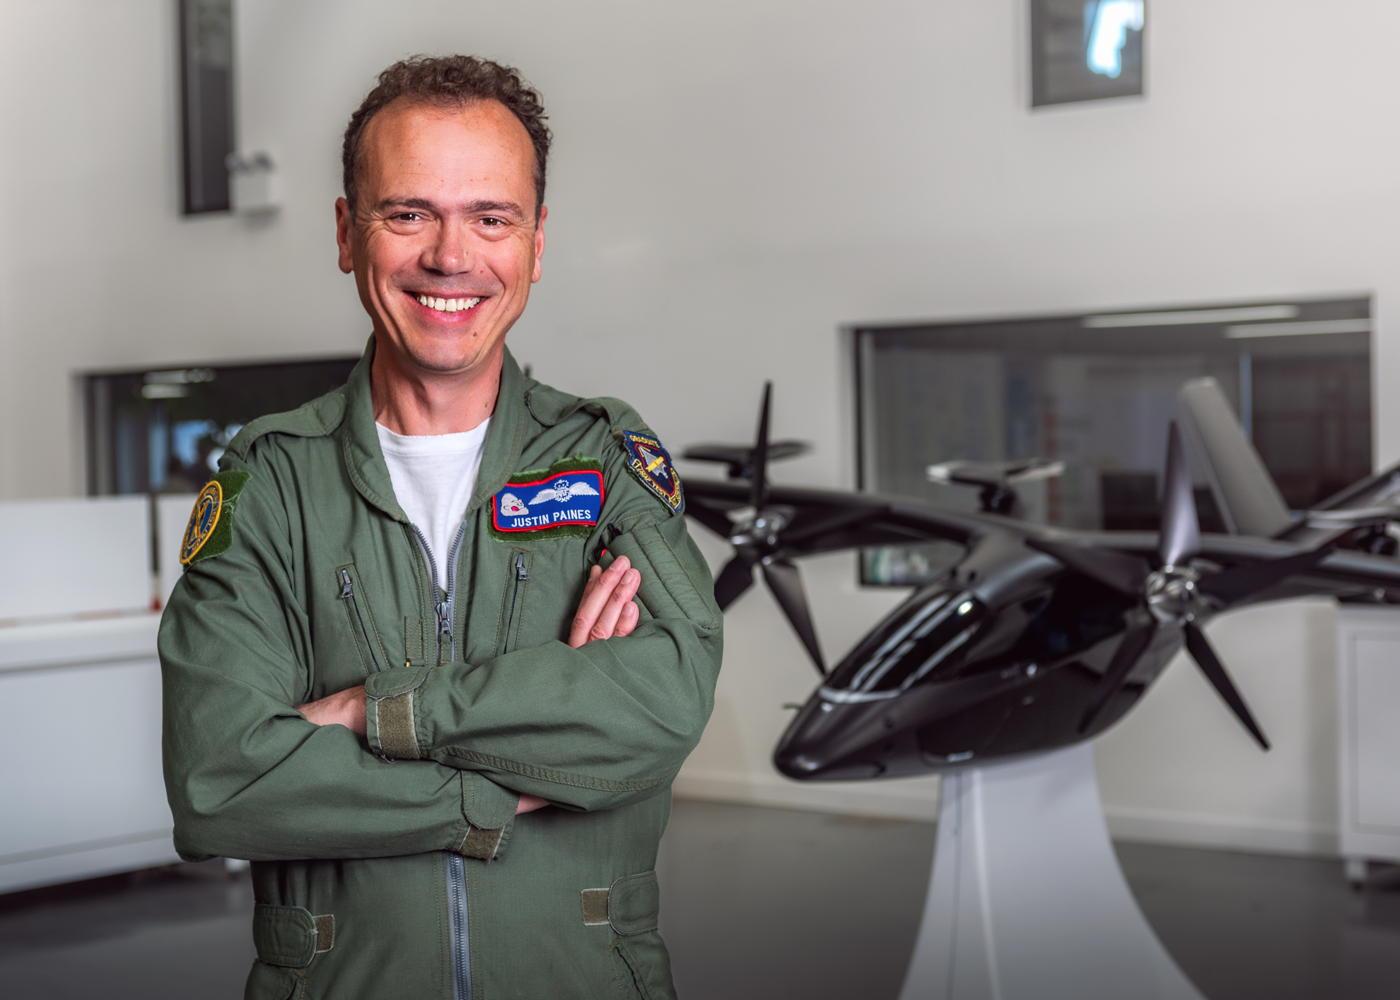 Justin Paines Vertical Aerospace